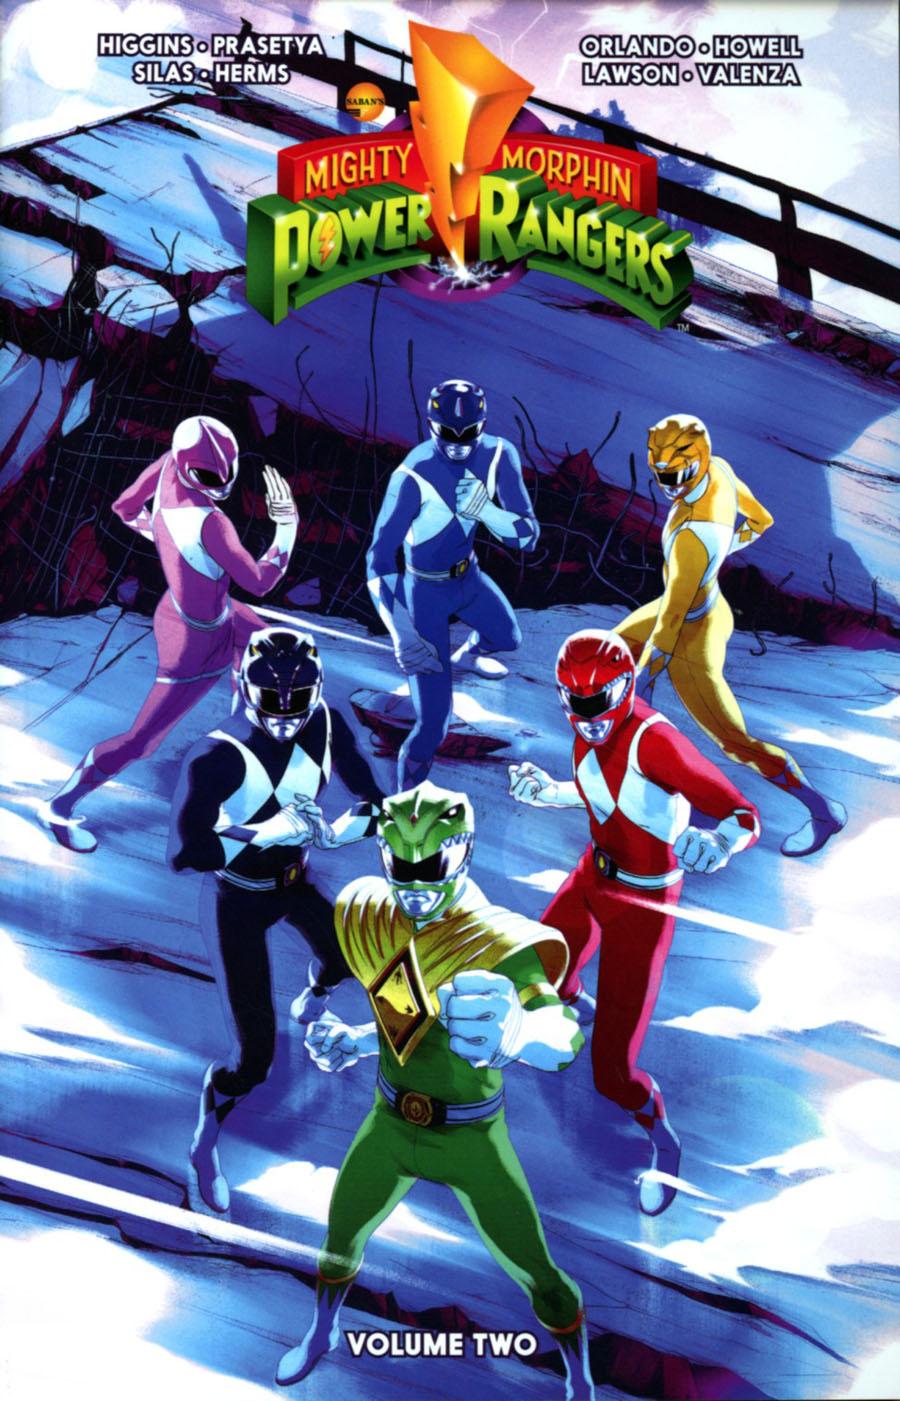 Mighty Morphin Power Rangers Vol 2 TP